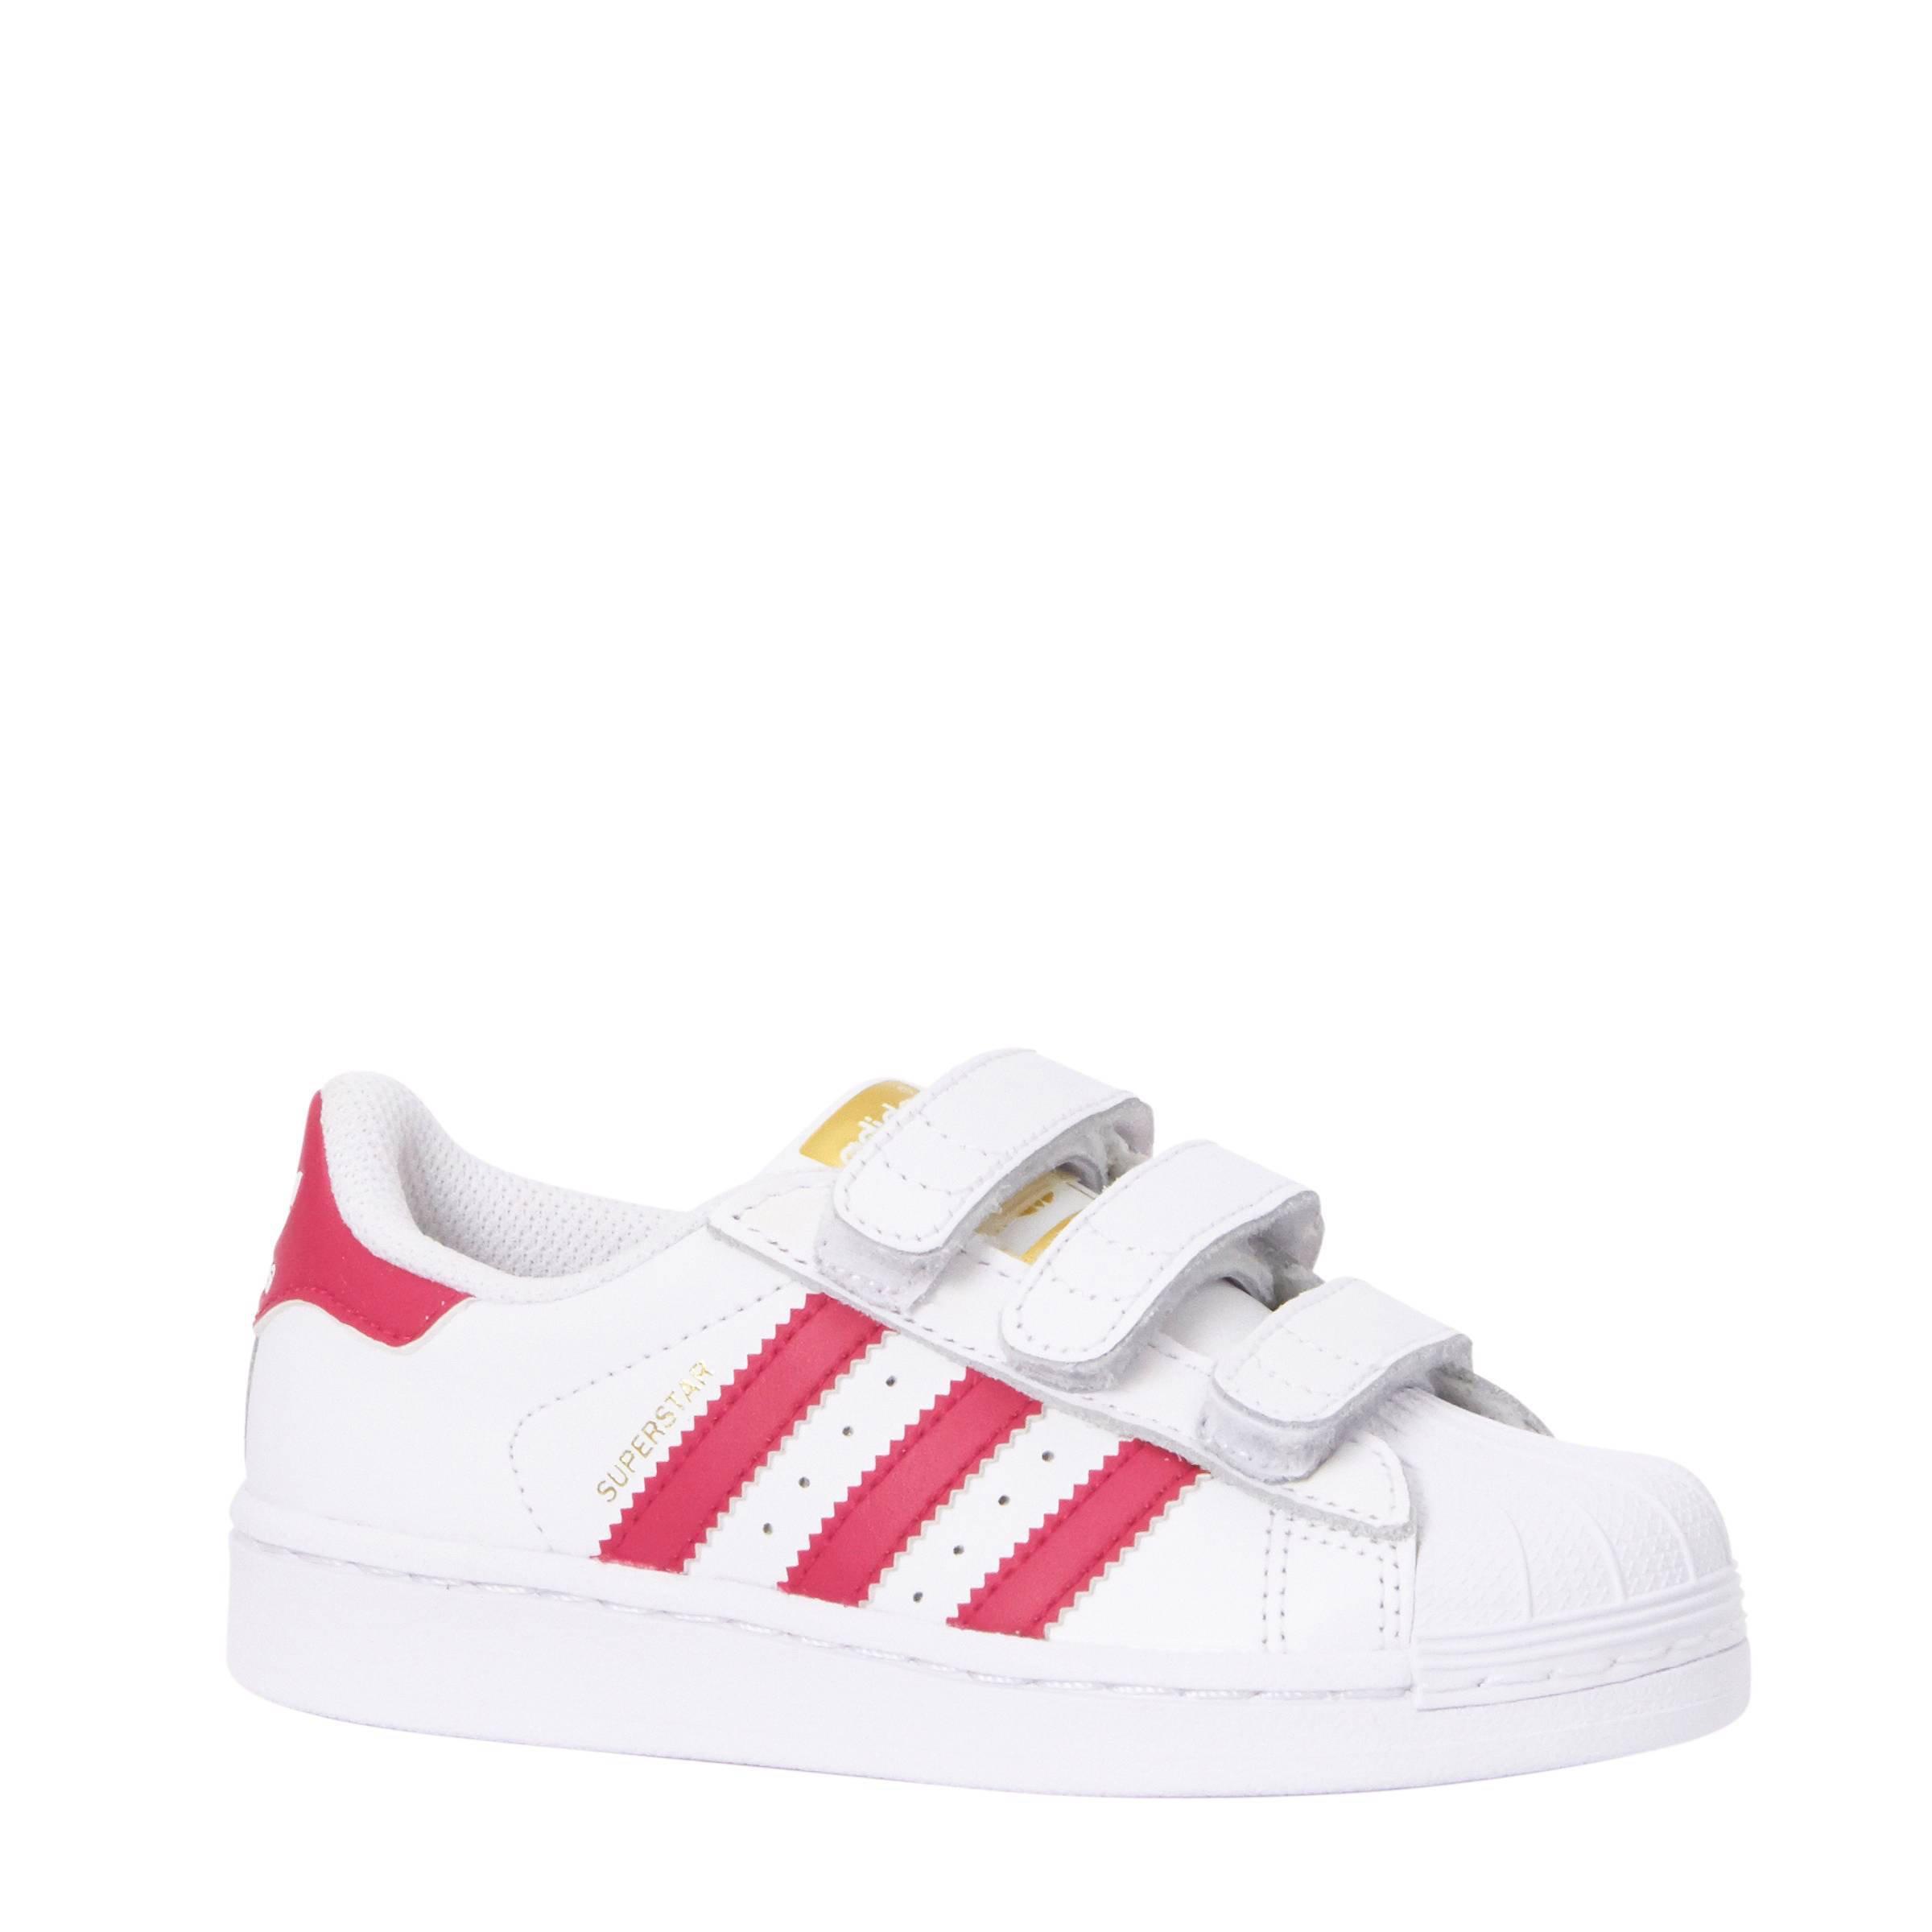 Wehkamp Sneakers Originals Adidas C Foundation Superstar RxT0O